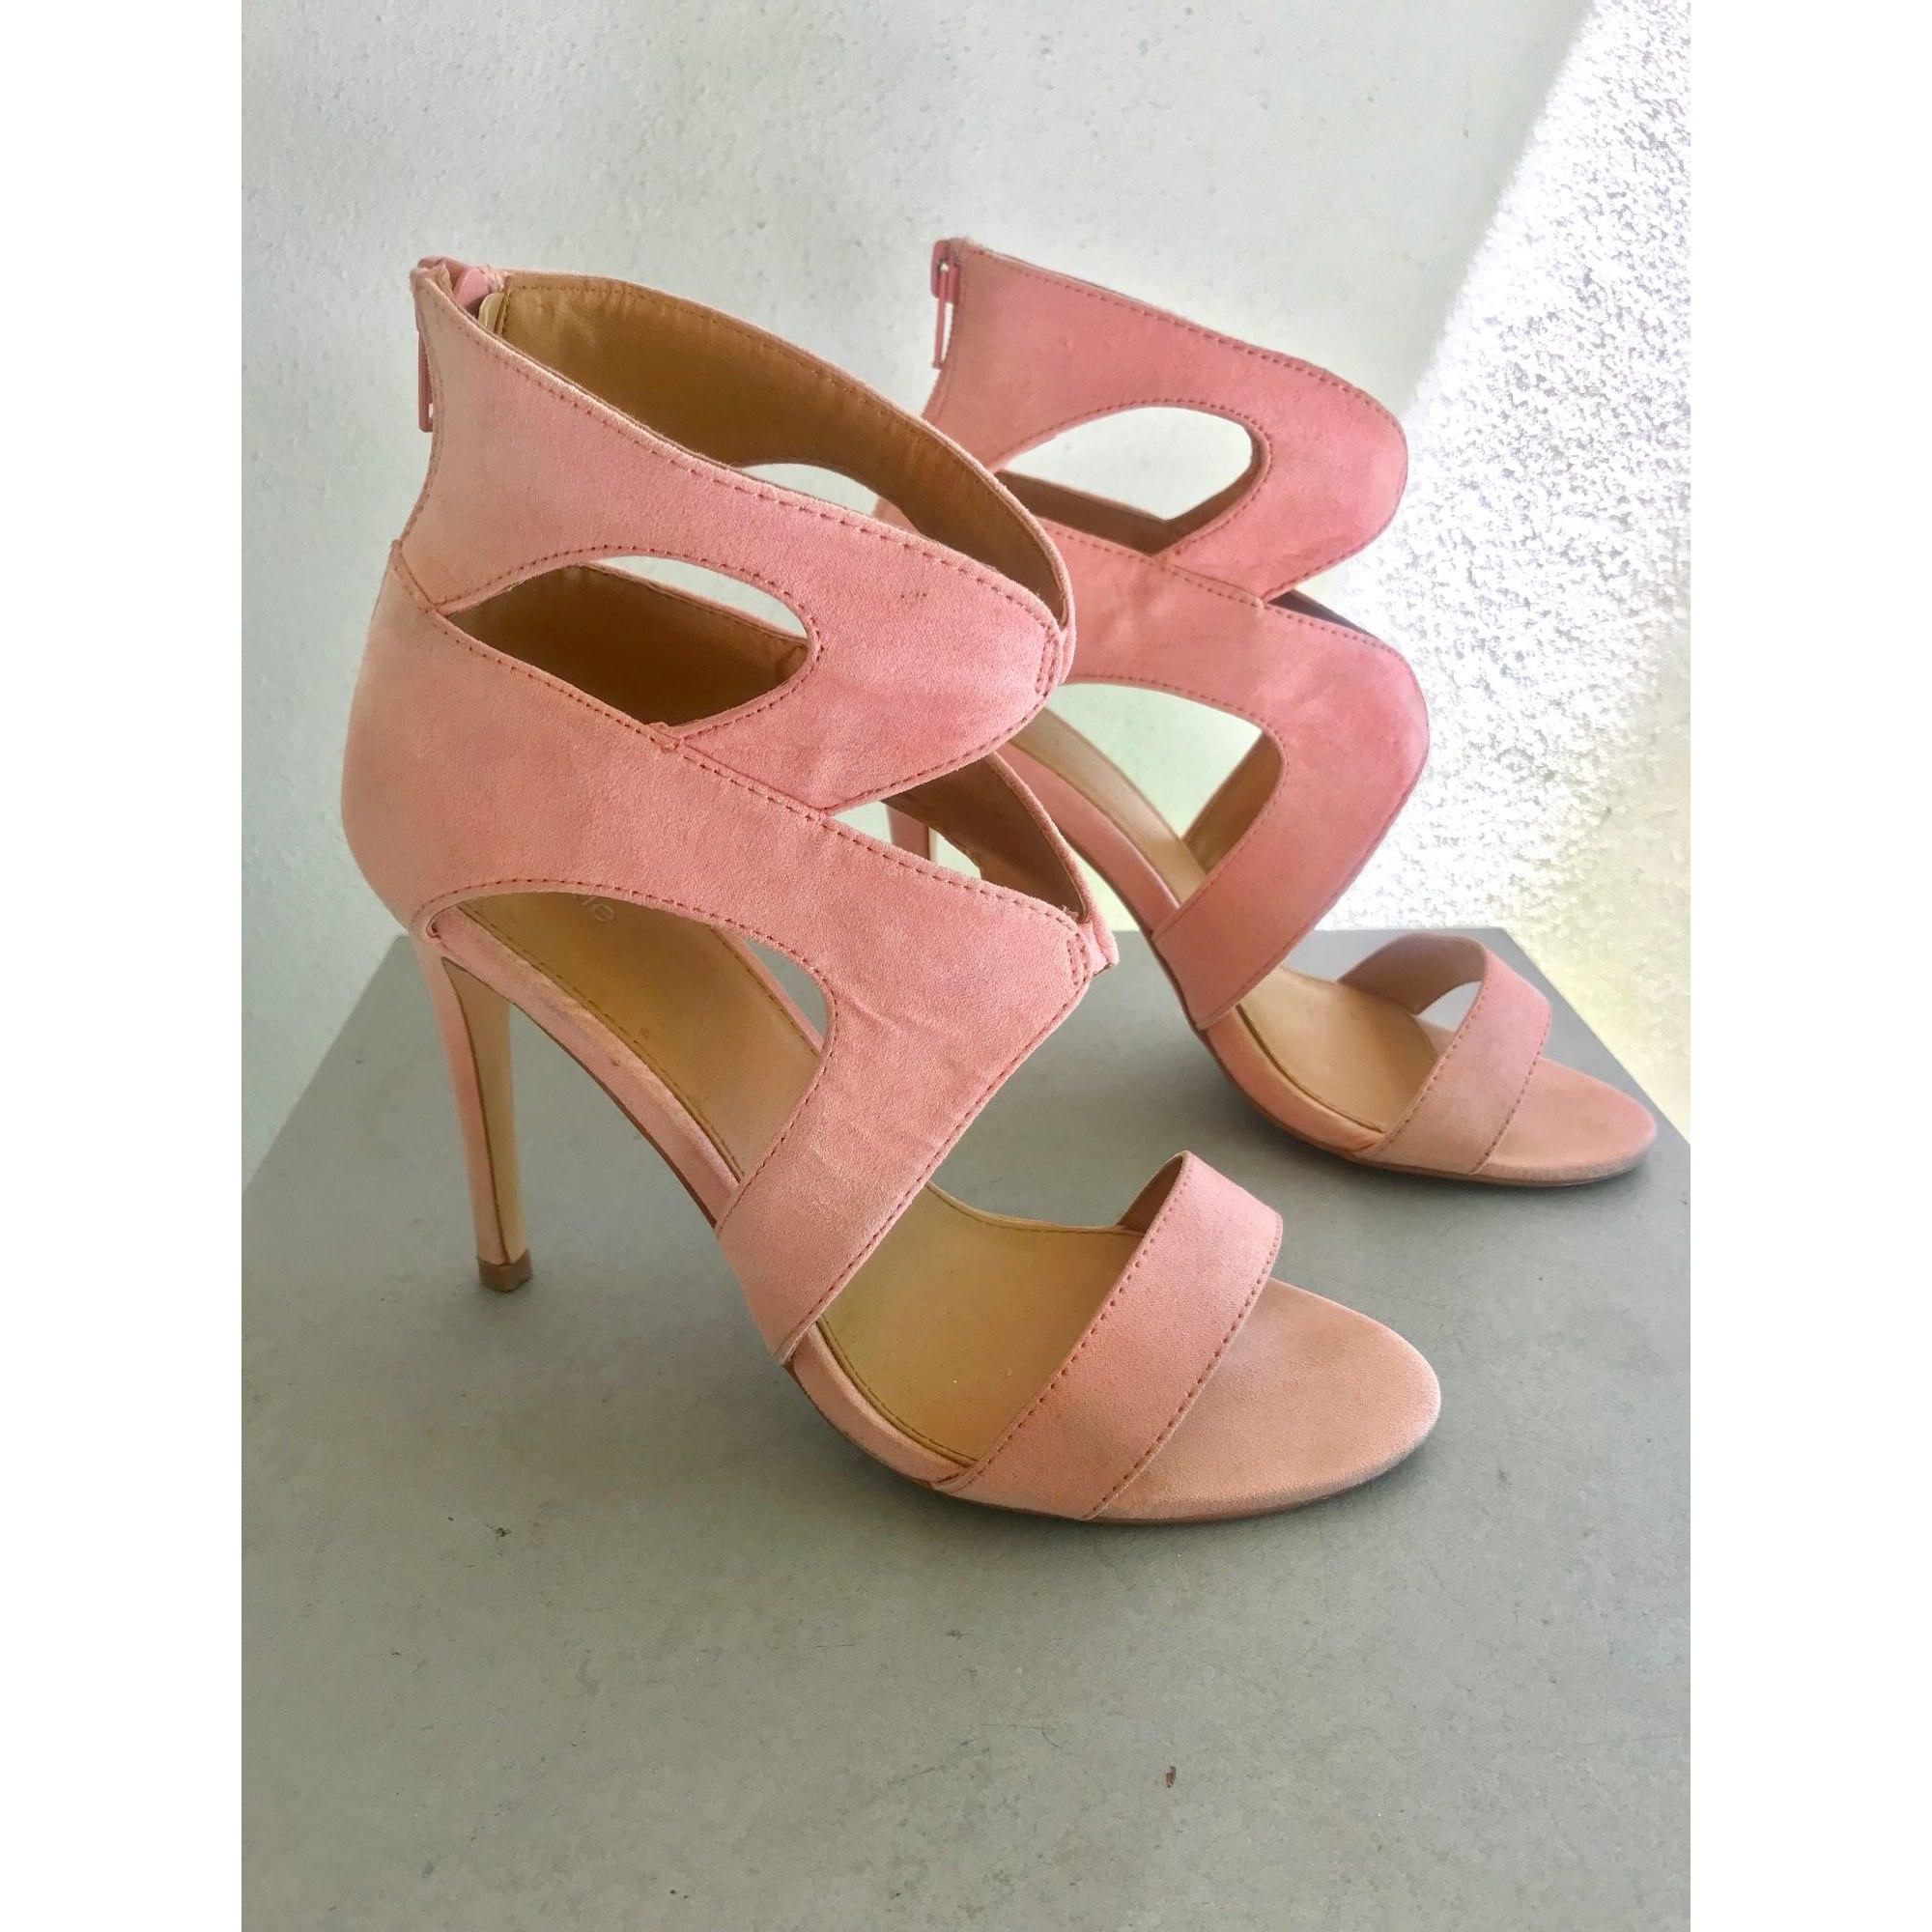 72ad21ae23 Heeled Sandals PIMKIE Pink, fuchsia, light pink